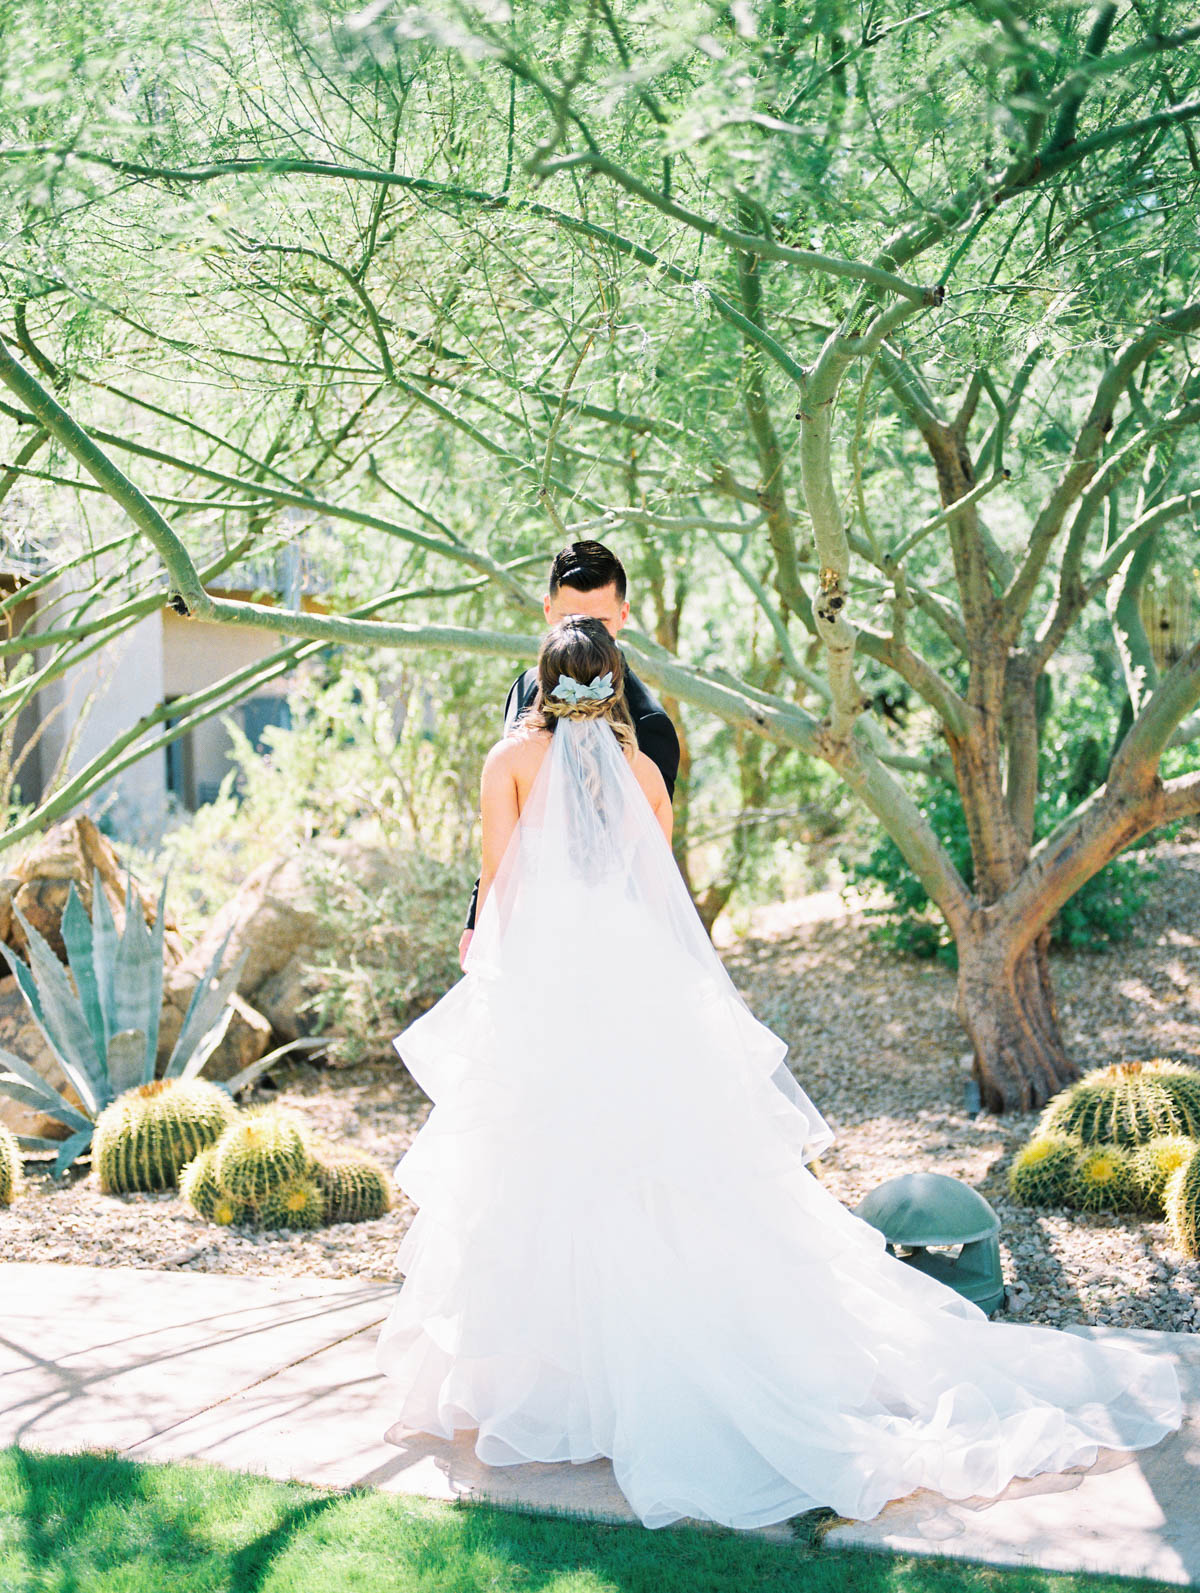 JW Marriott wedding captured by Tucson Wedding Photographers Betsy & John